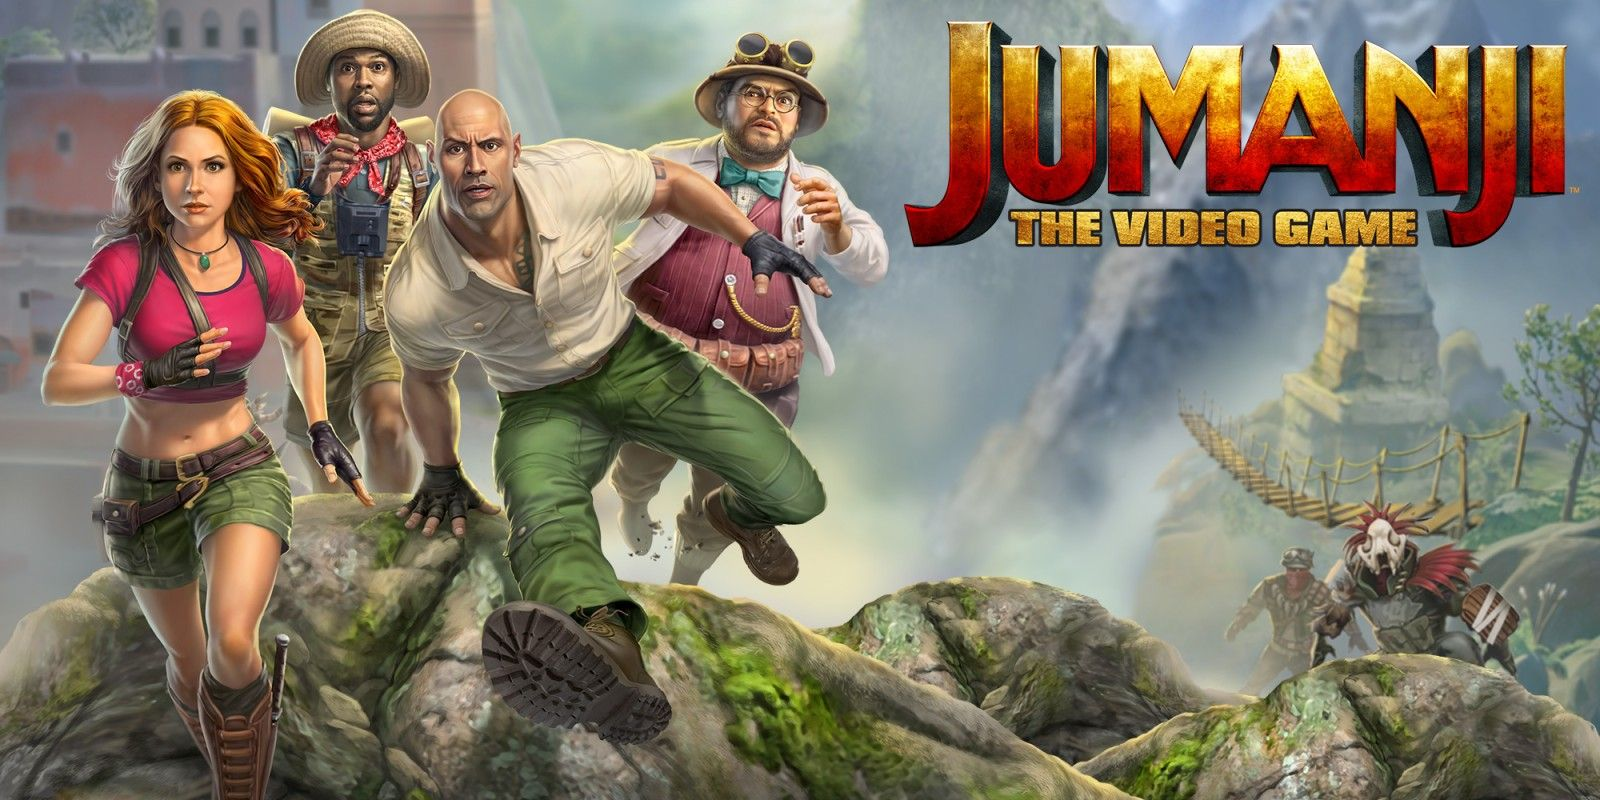 Jumanji: Bandai Namco Releases Launch Trailer For Video Game Adaptation